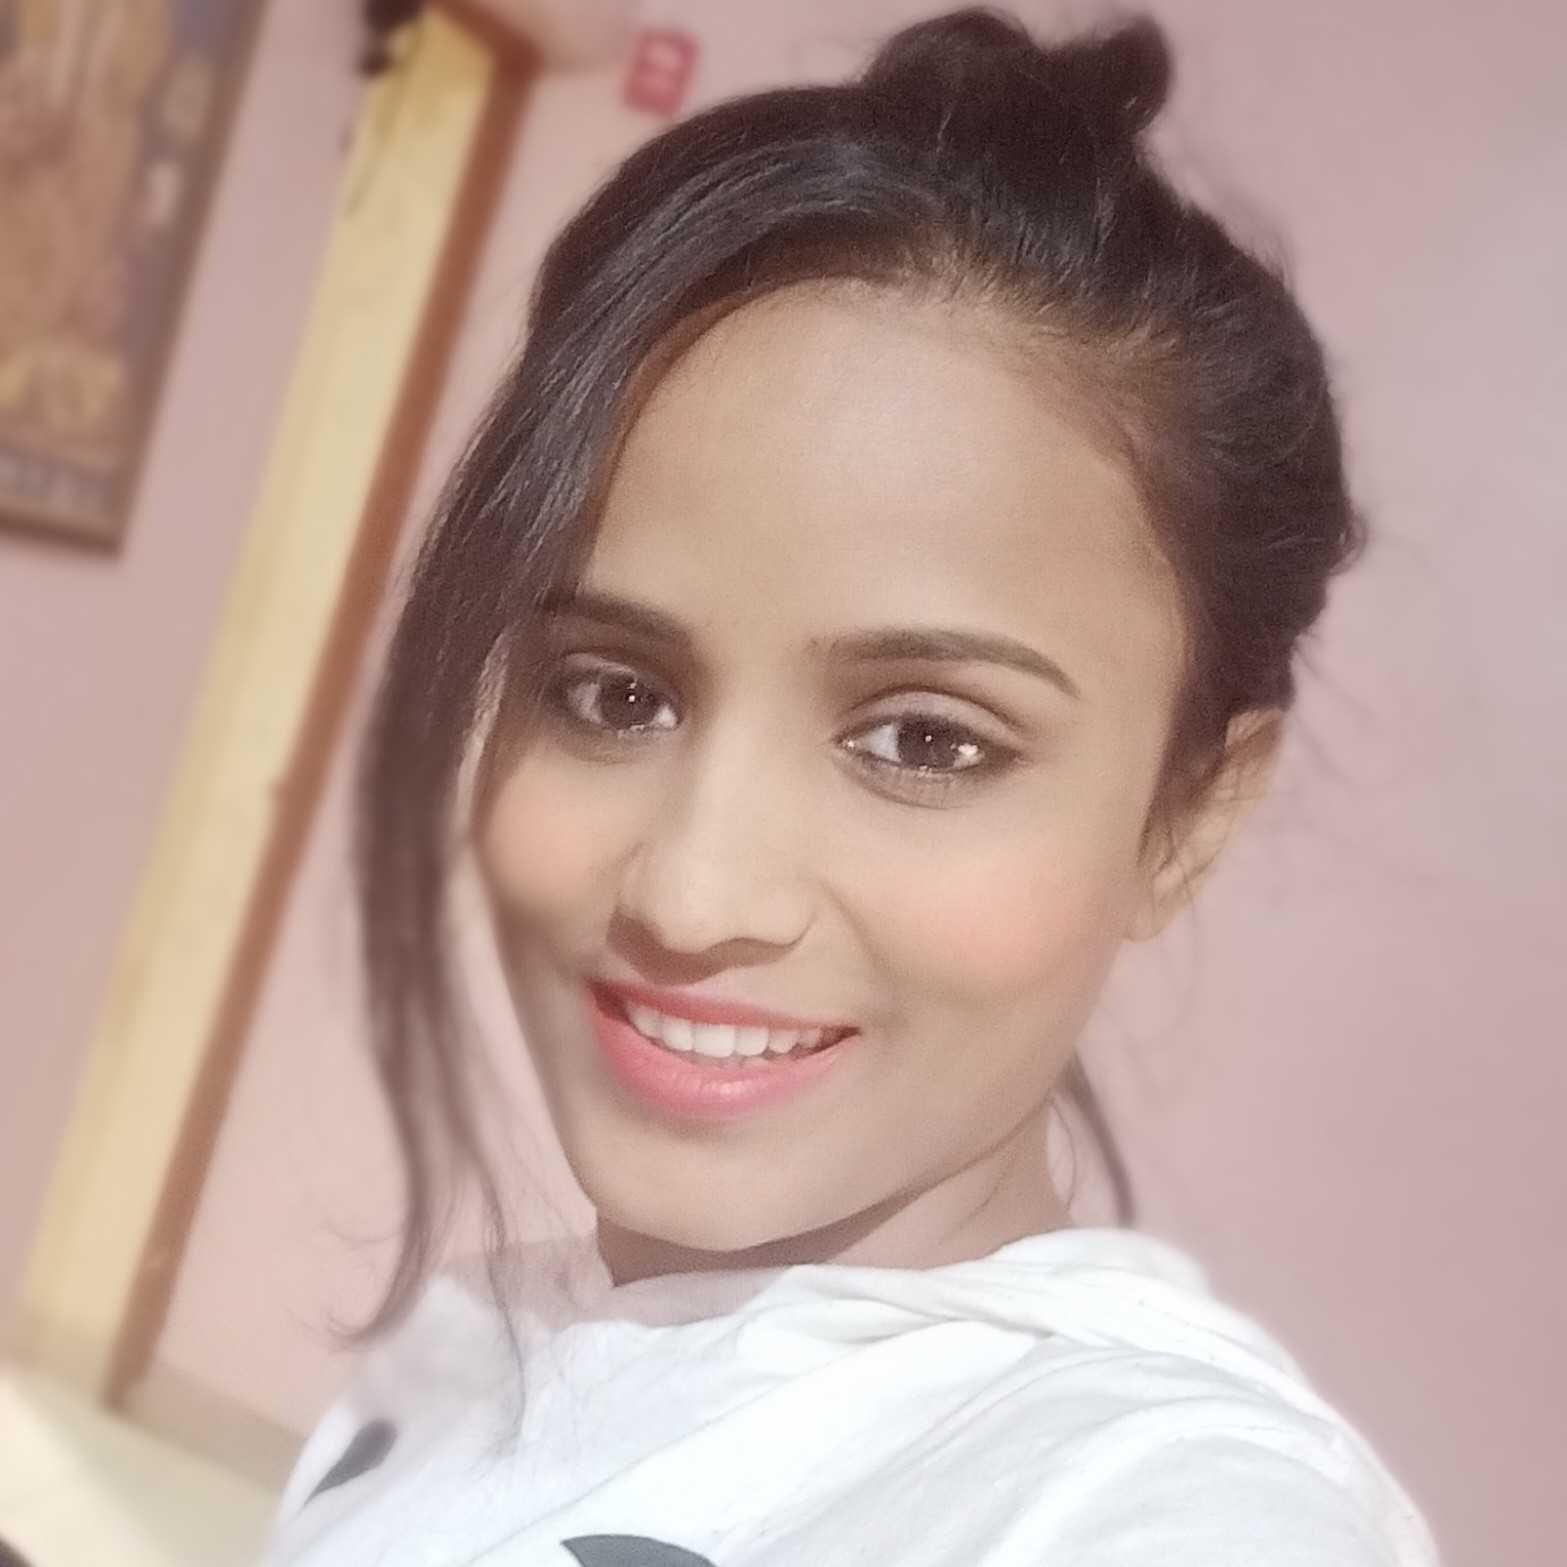 NR production (Nisha Ritesh)